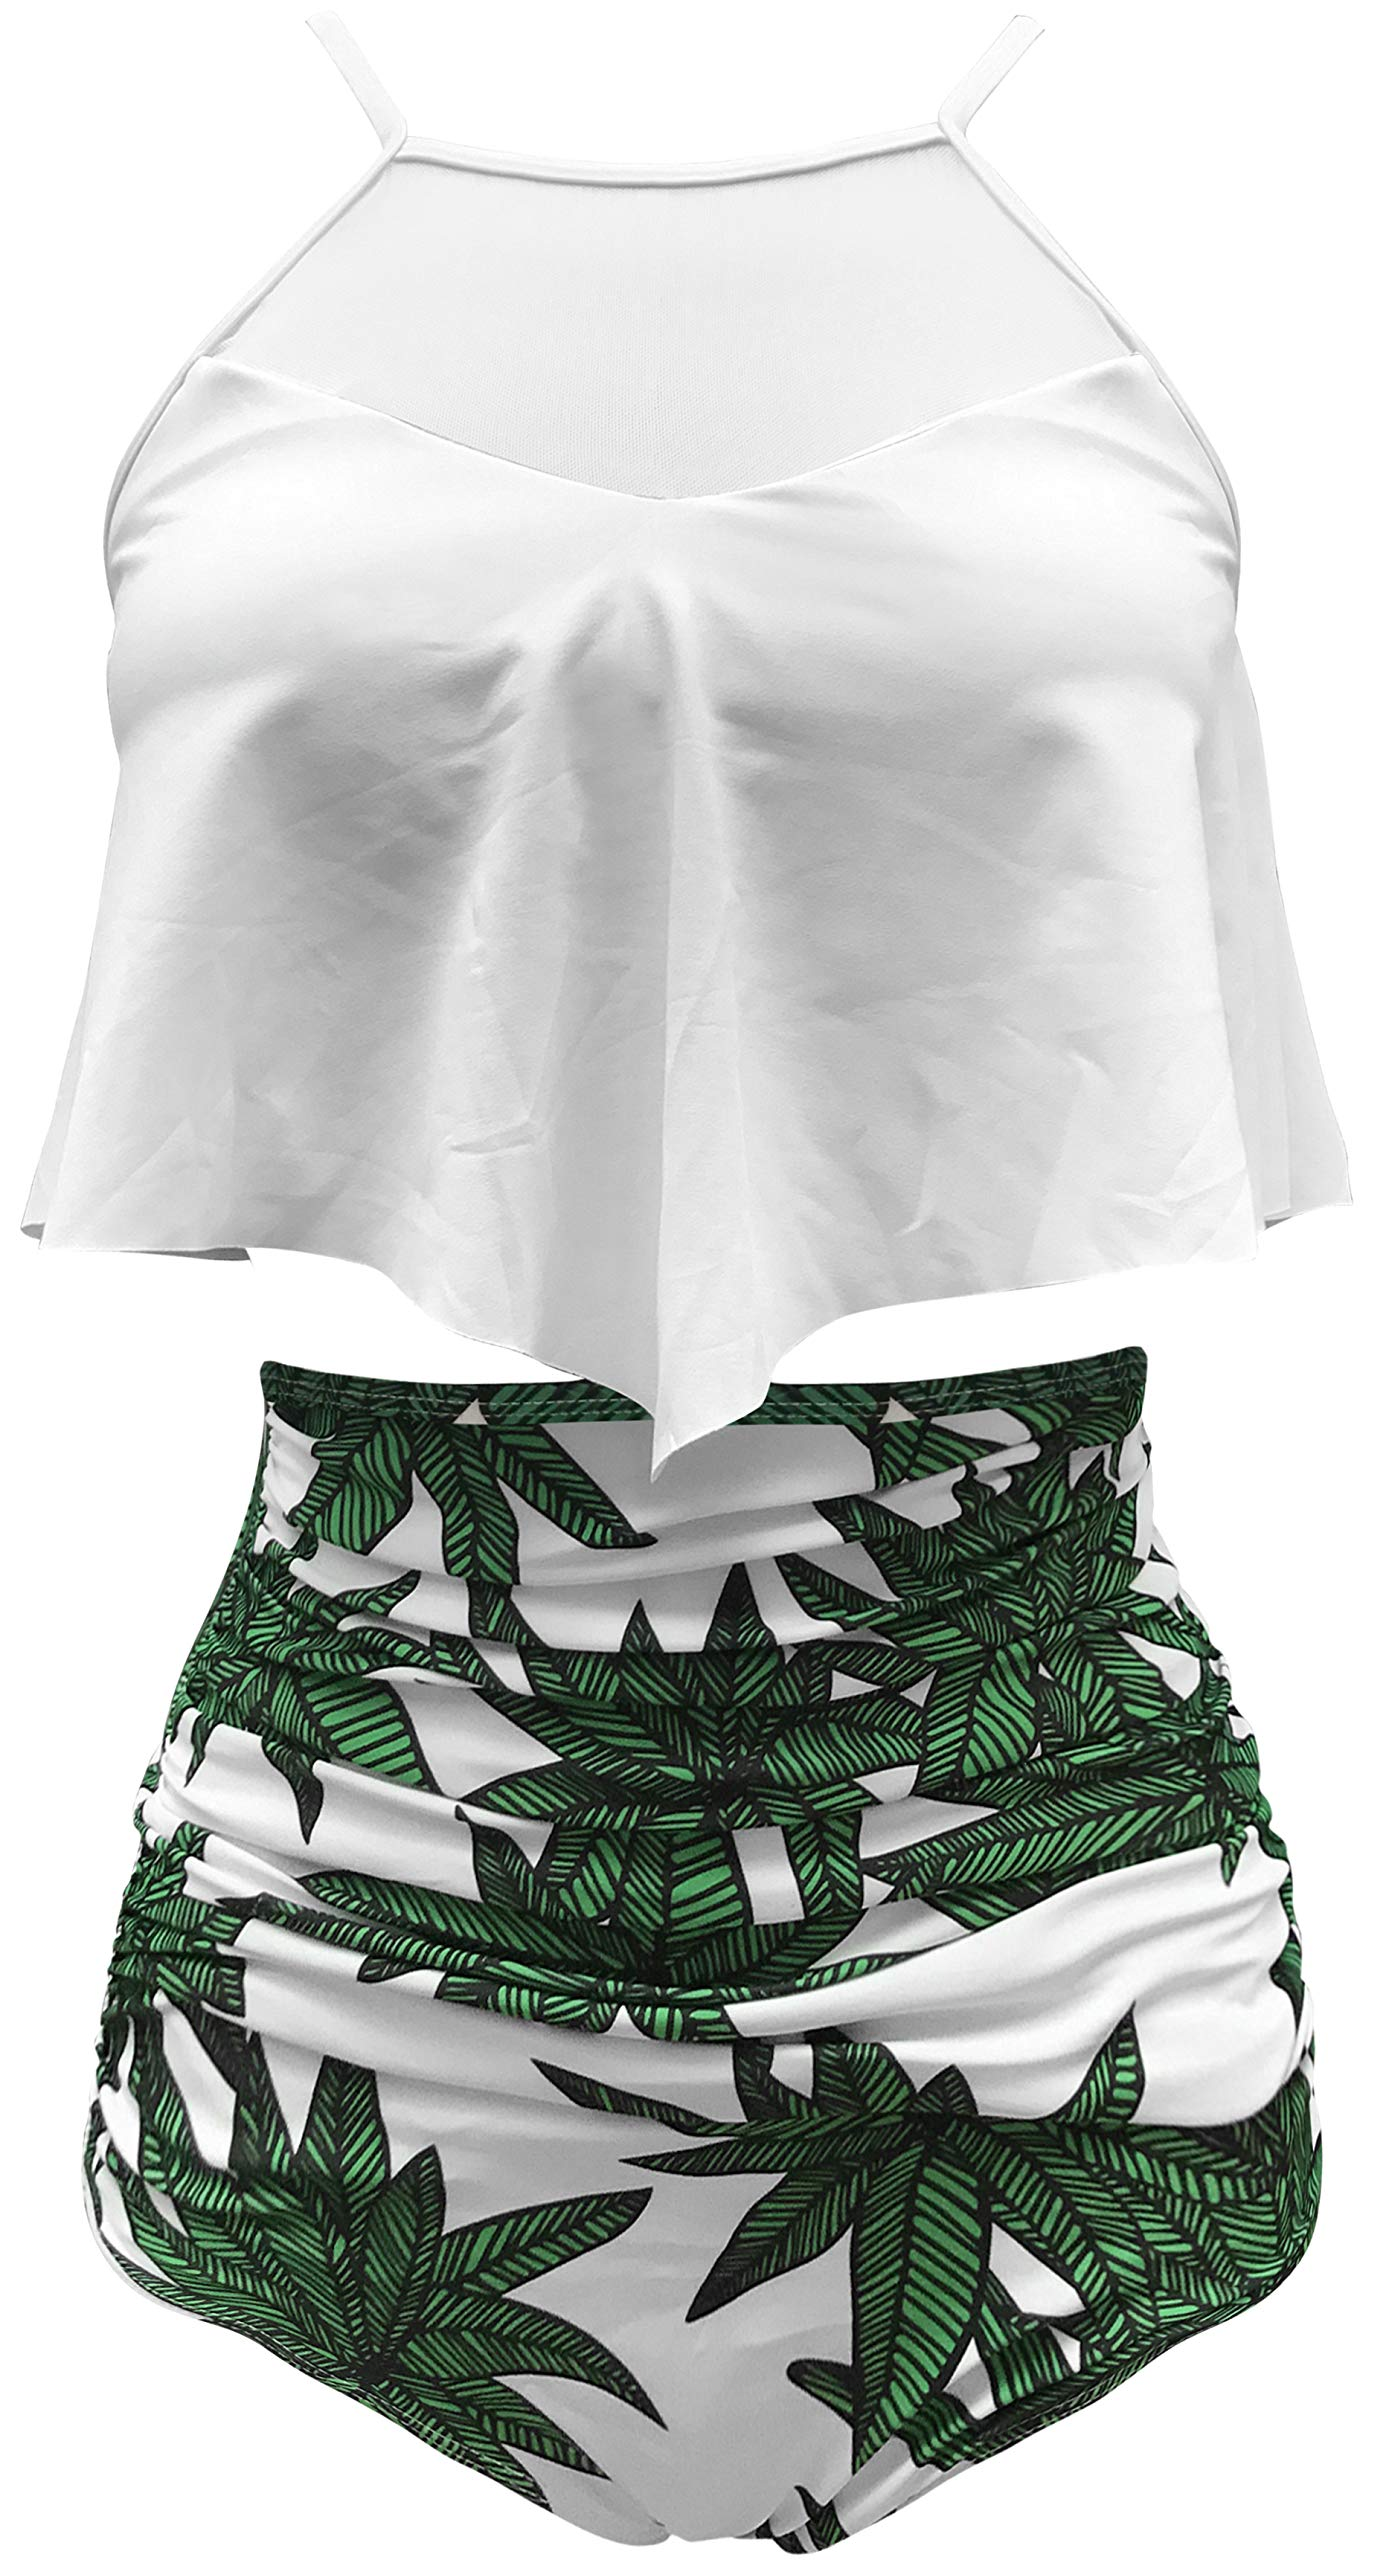 Gabrielle-Aug Women's Sexy Bikini Top & High Waist Shorts Falbala Soild Floral Flounce Bikini Set Swimwear(FBA) (16, White&Floral)